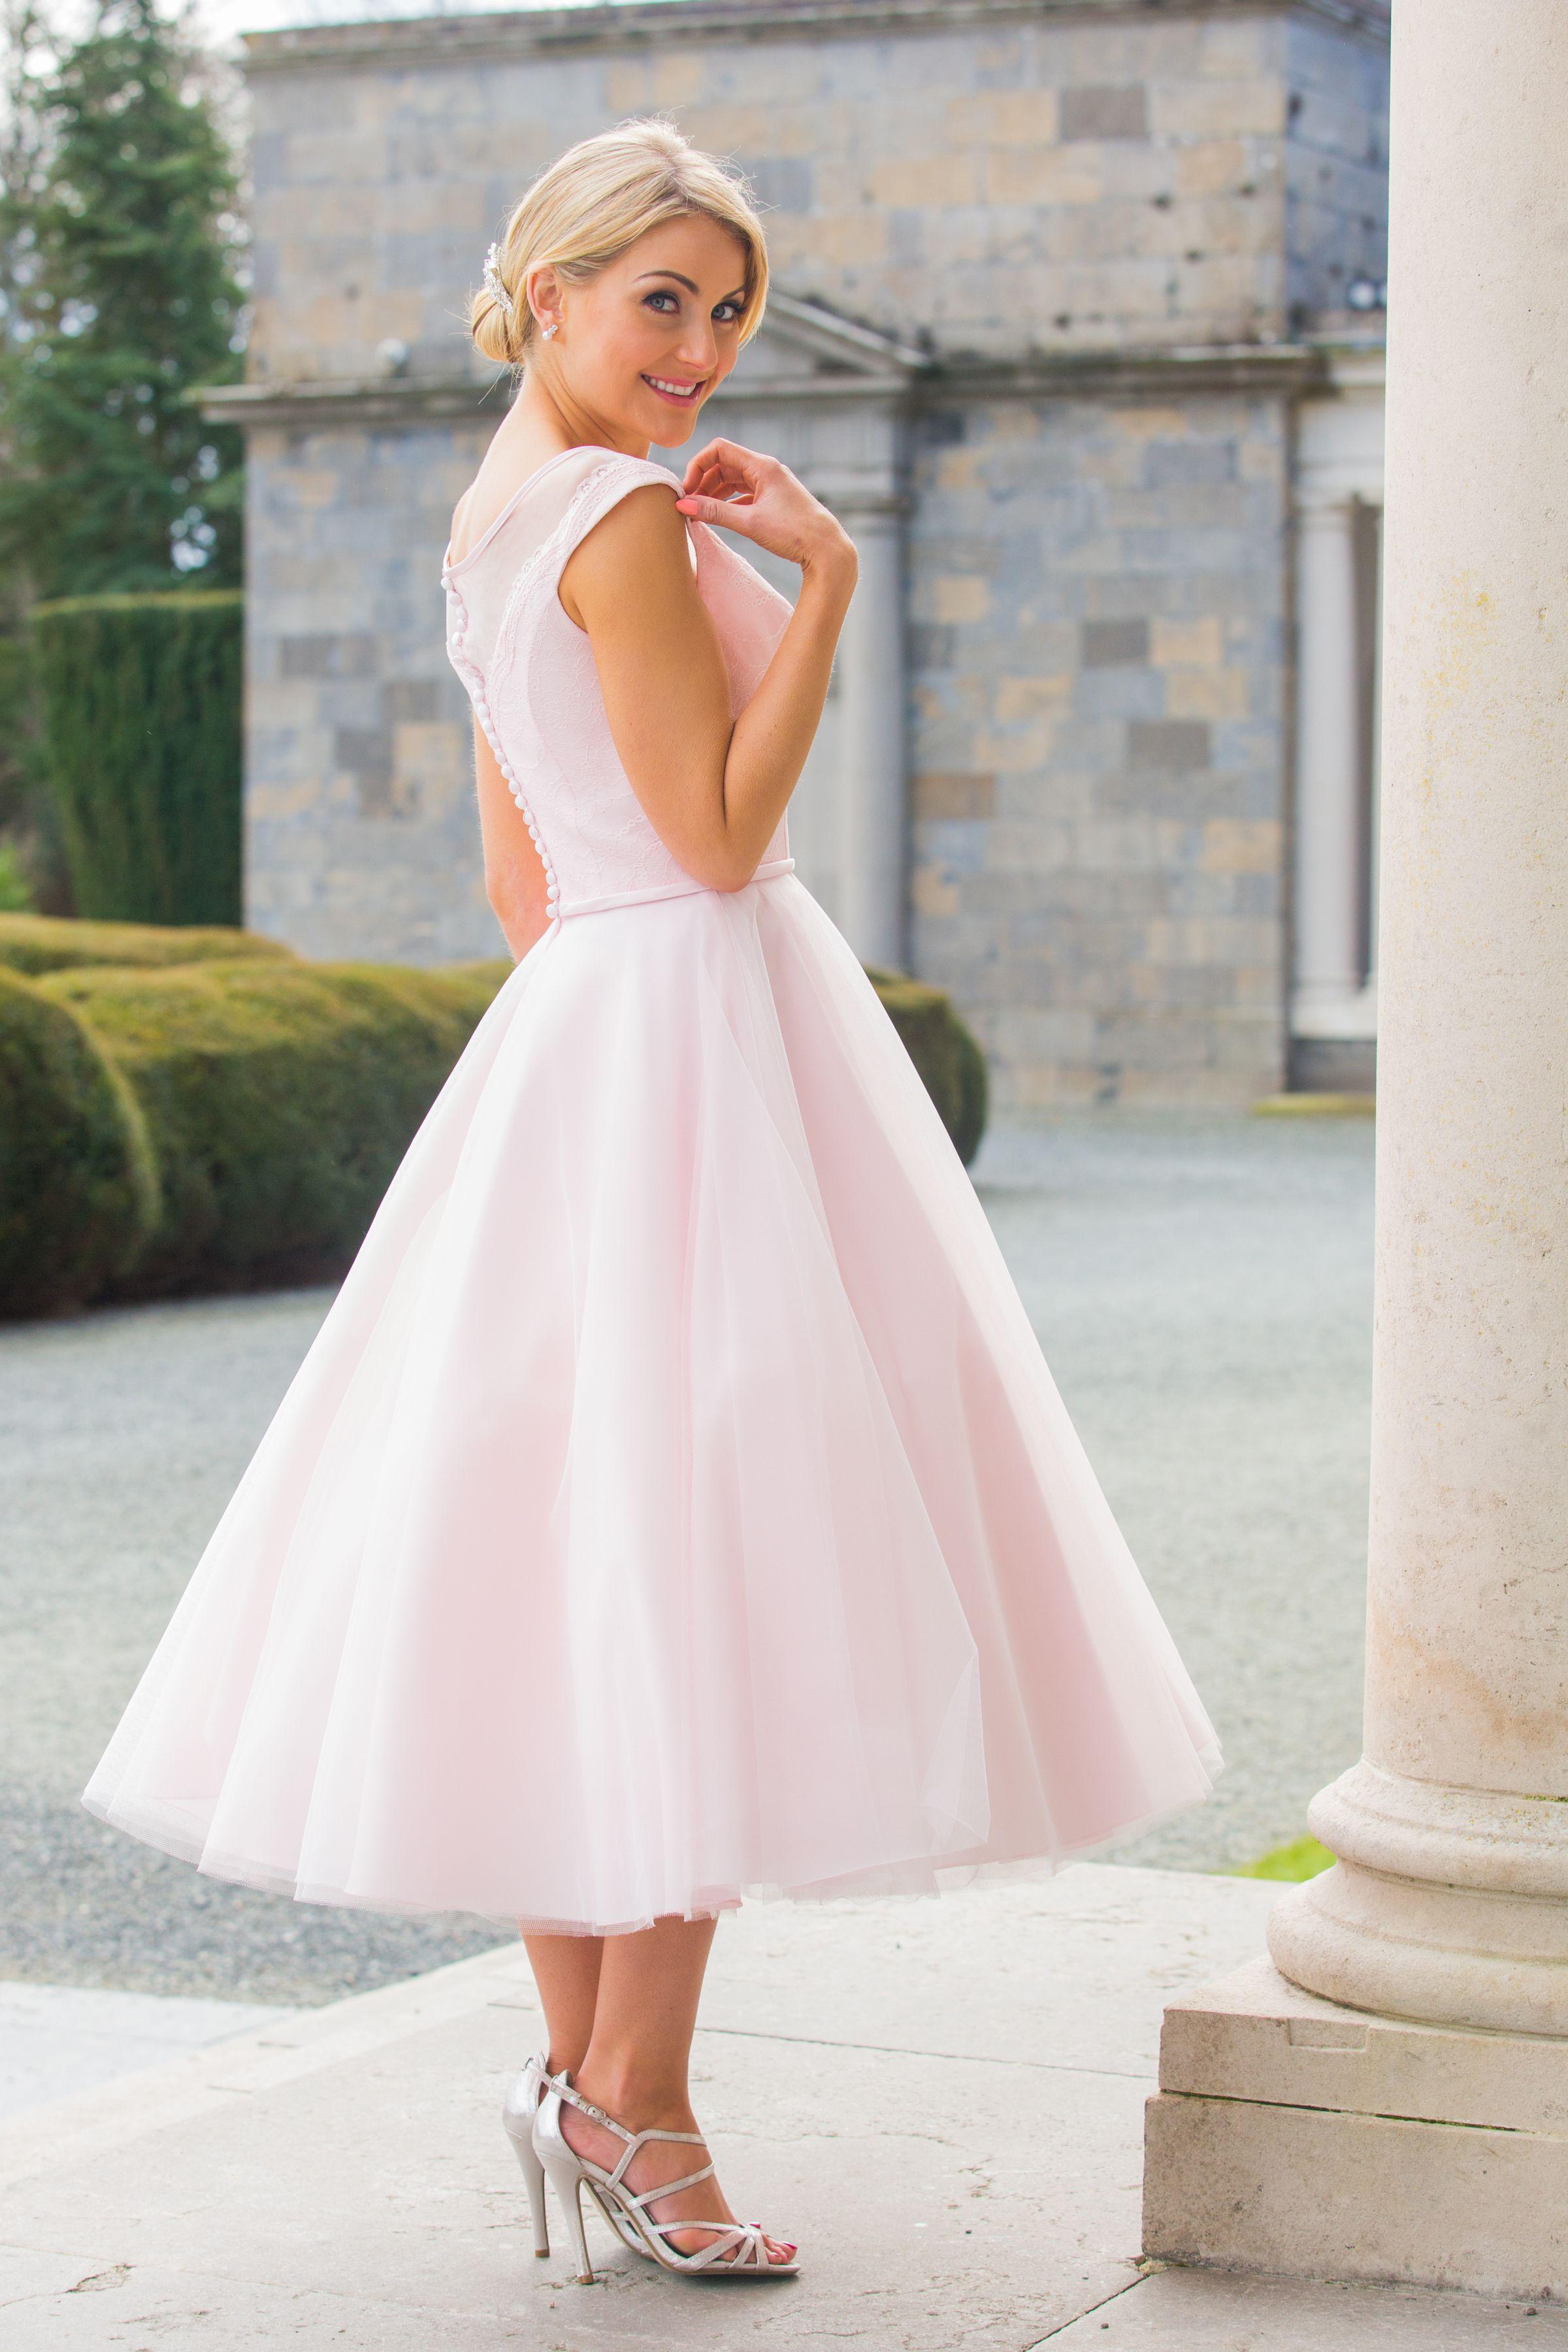 GIRLS VINTAGE STYLE PASTEL PINK LACE TRIM CHIFFON MIDI WEDDING PROM PARTY DRESS